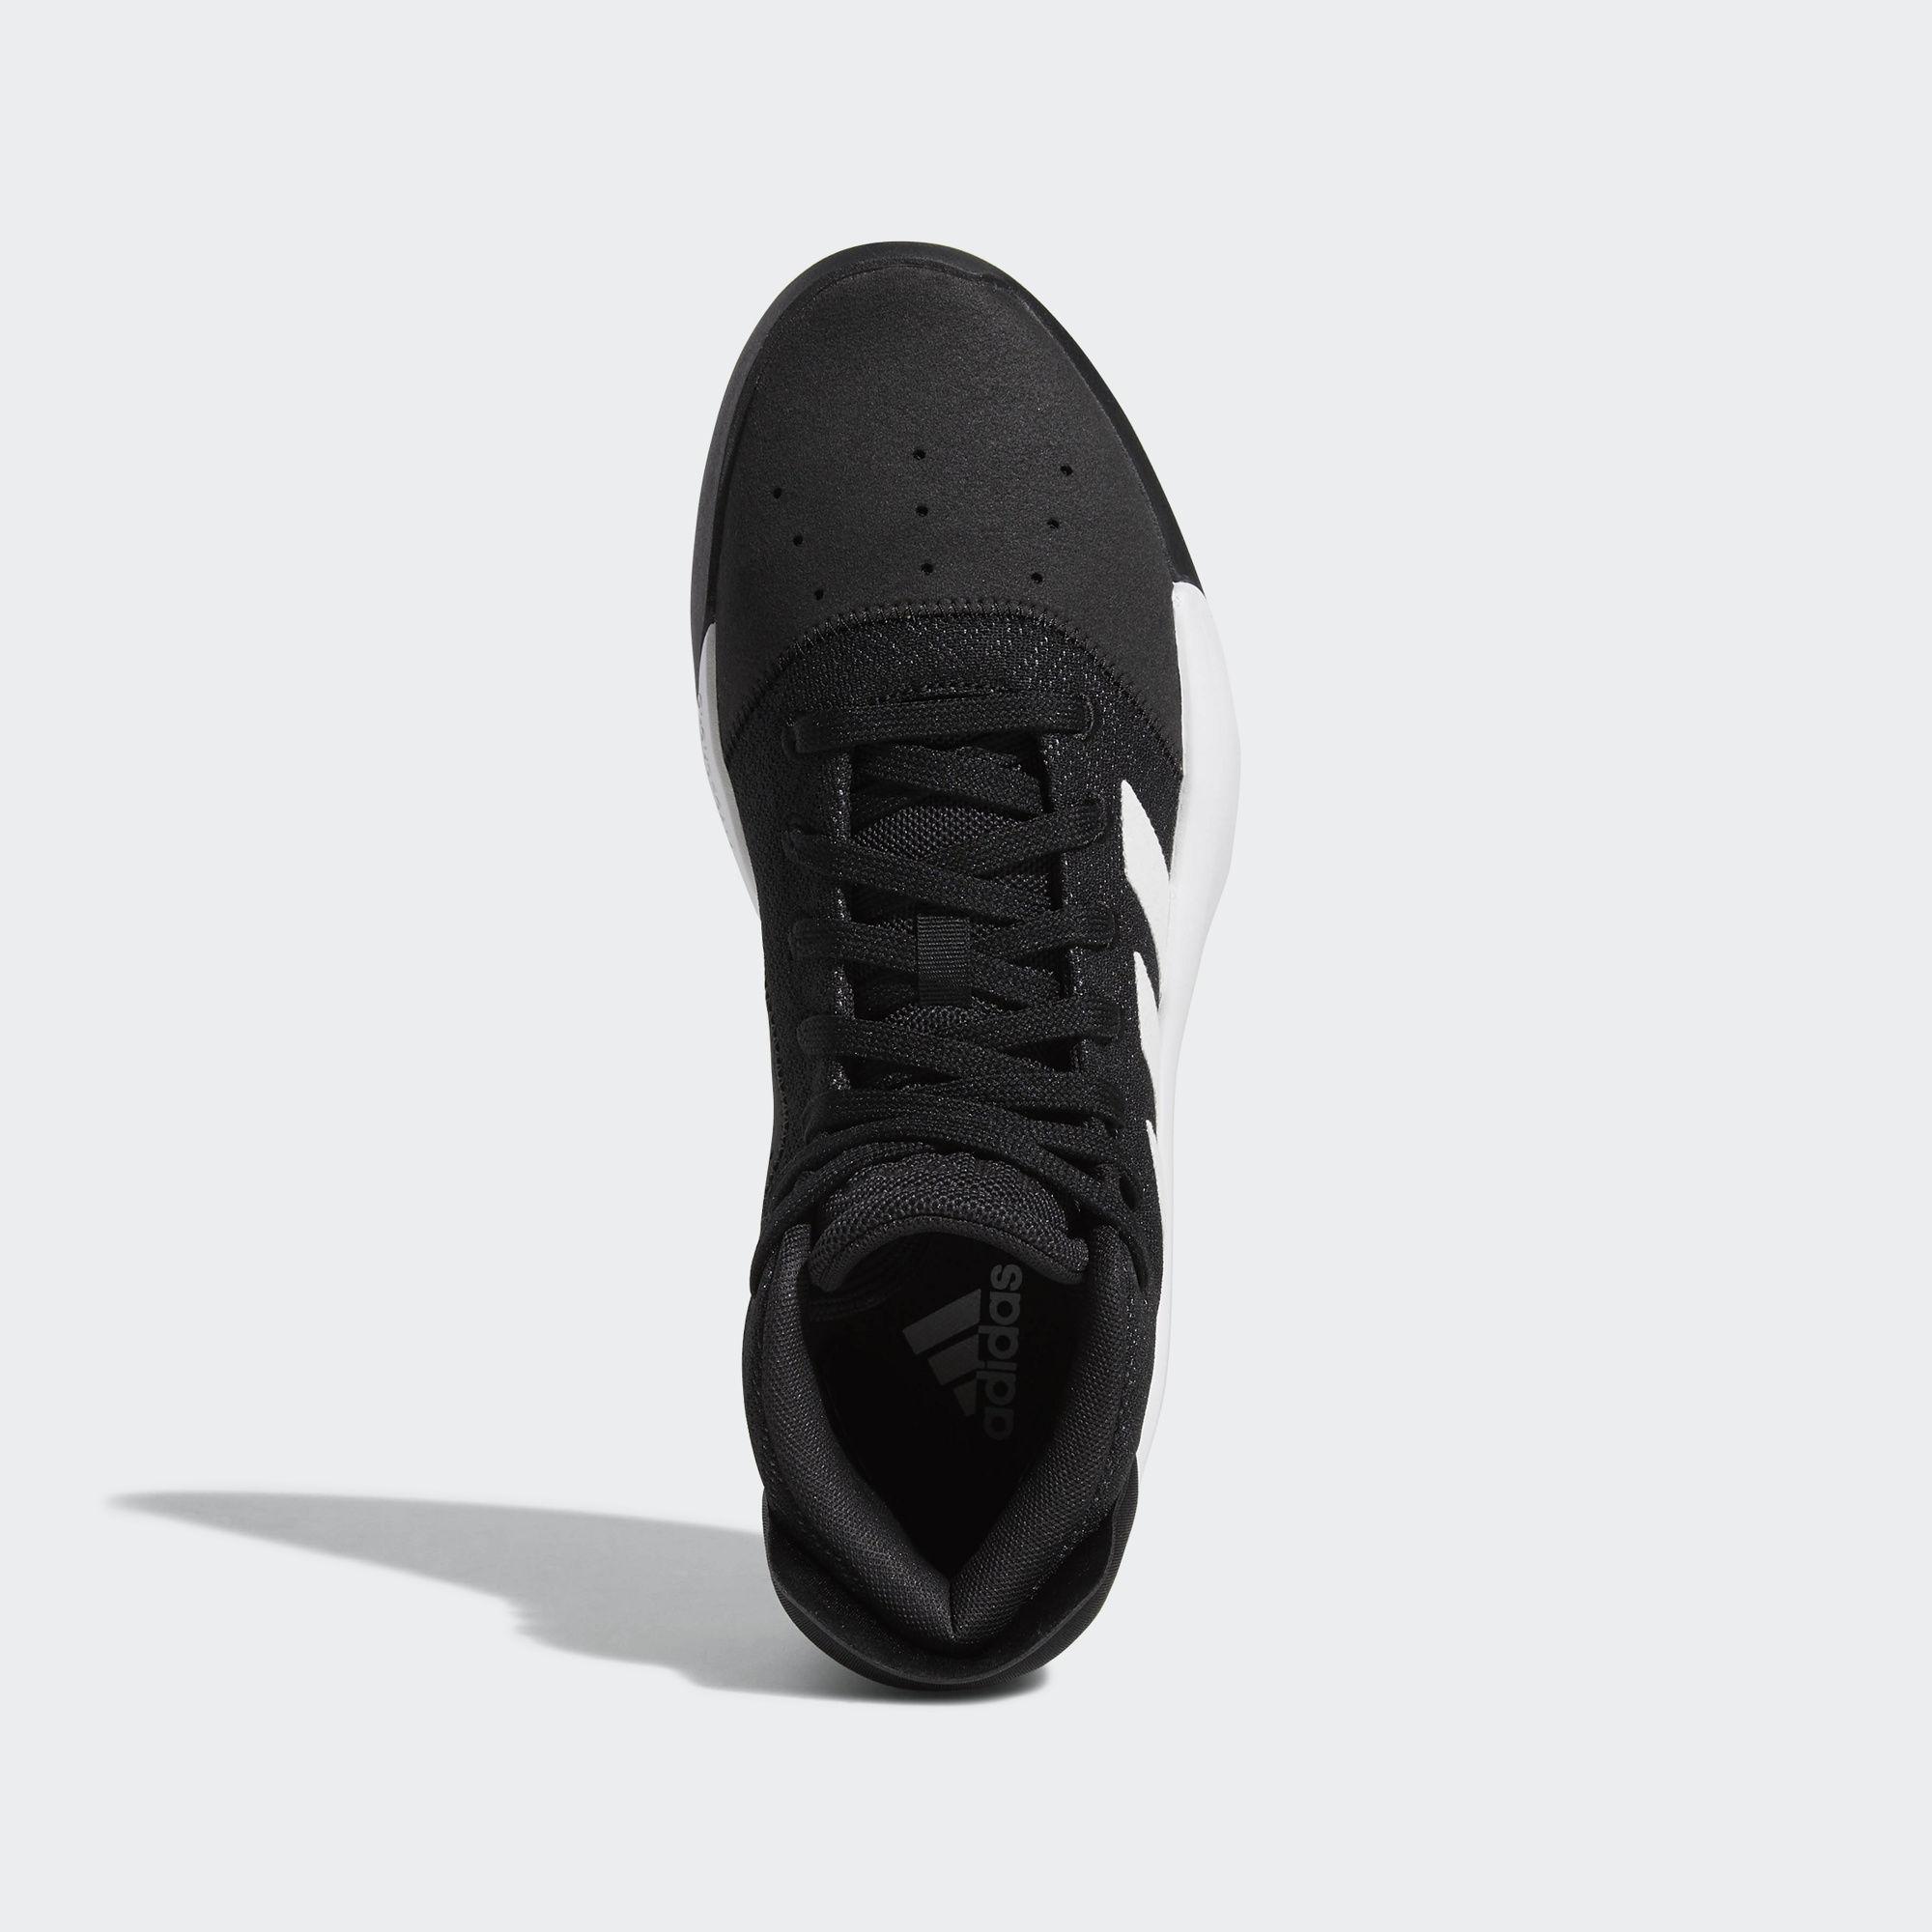 huge discount 1742e 0d0e5 Adidas - Black Pro Adversary 2019 Shoes for Men - Lyst. View fullscreen